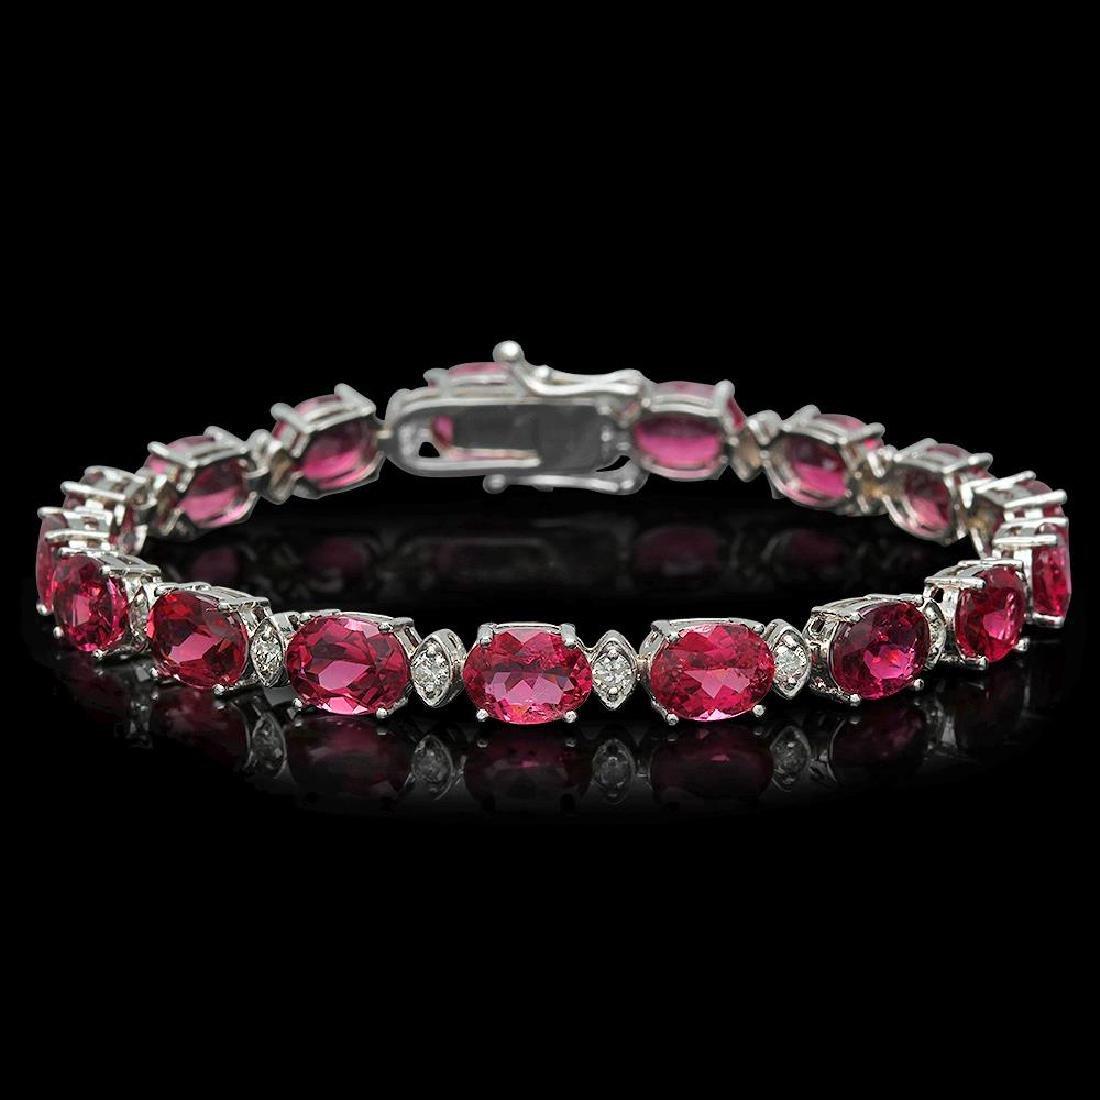 14K Gold 22.52ct Tourmaline 1.02ct Diamond Bracelet